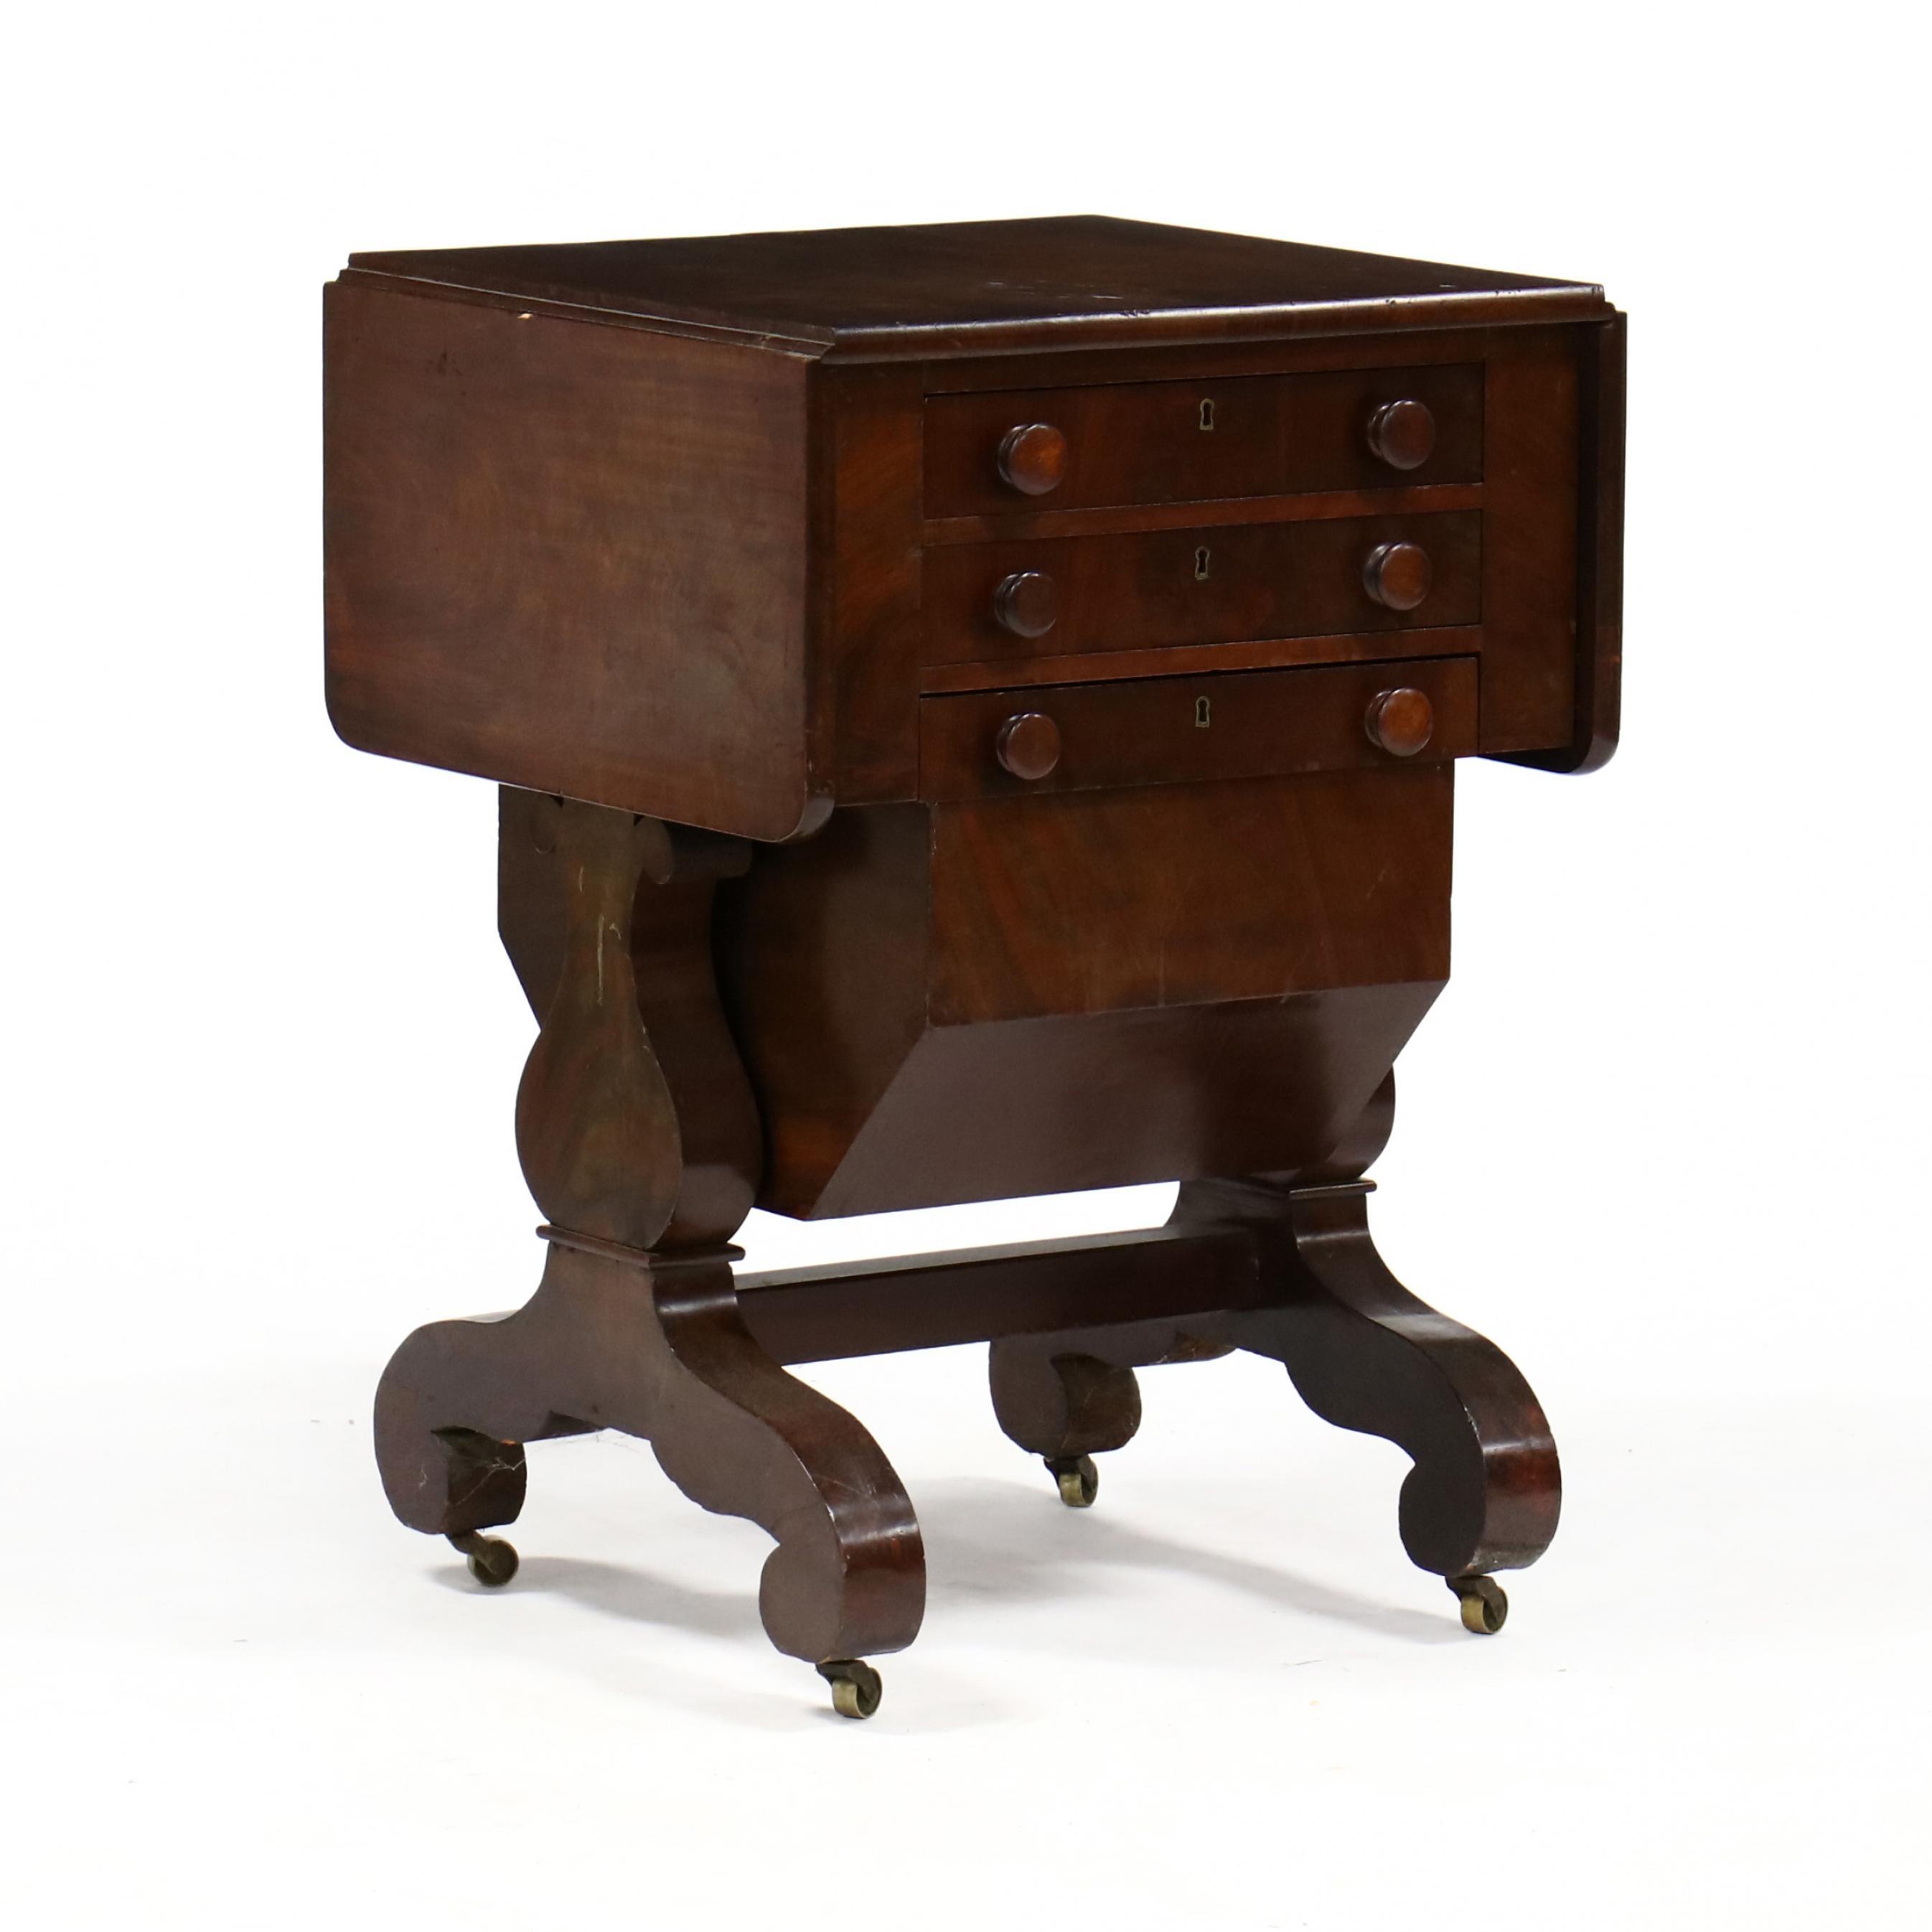 american-classical-mahogany-sewing-table